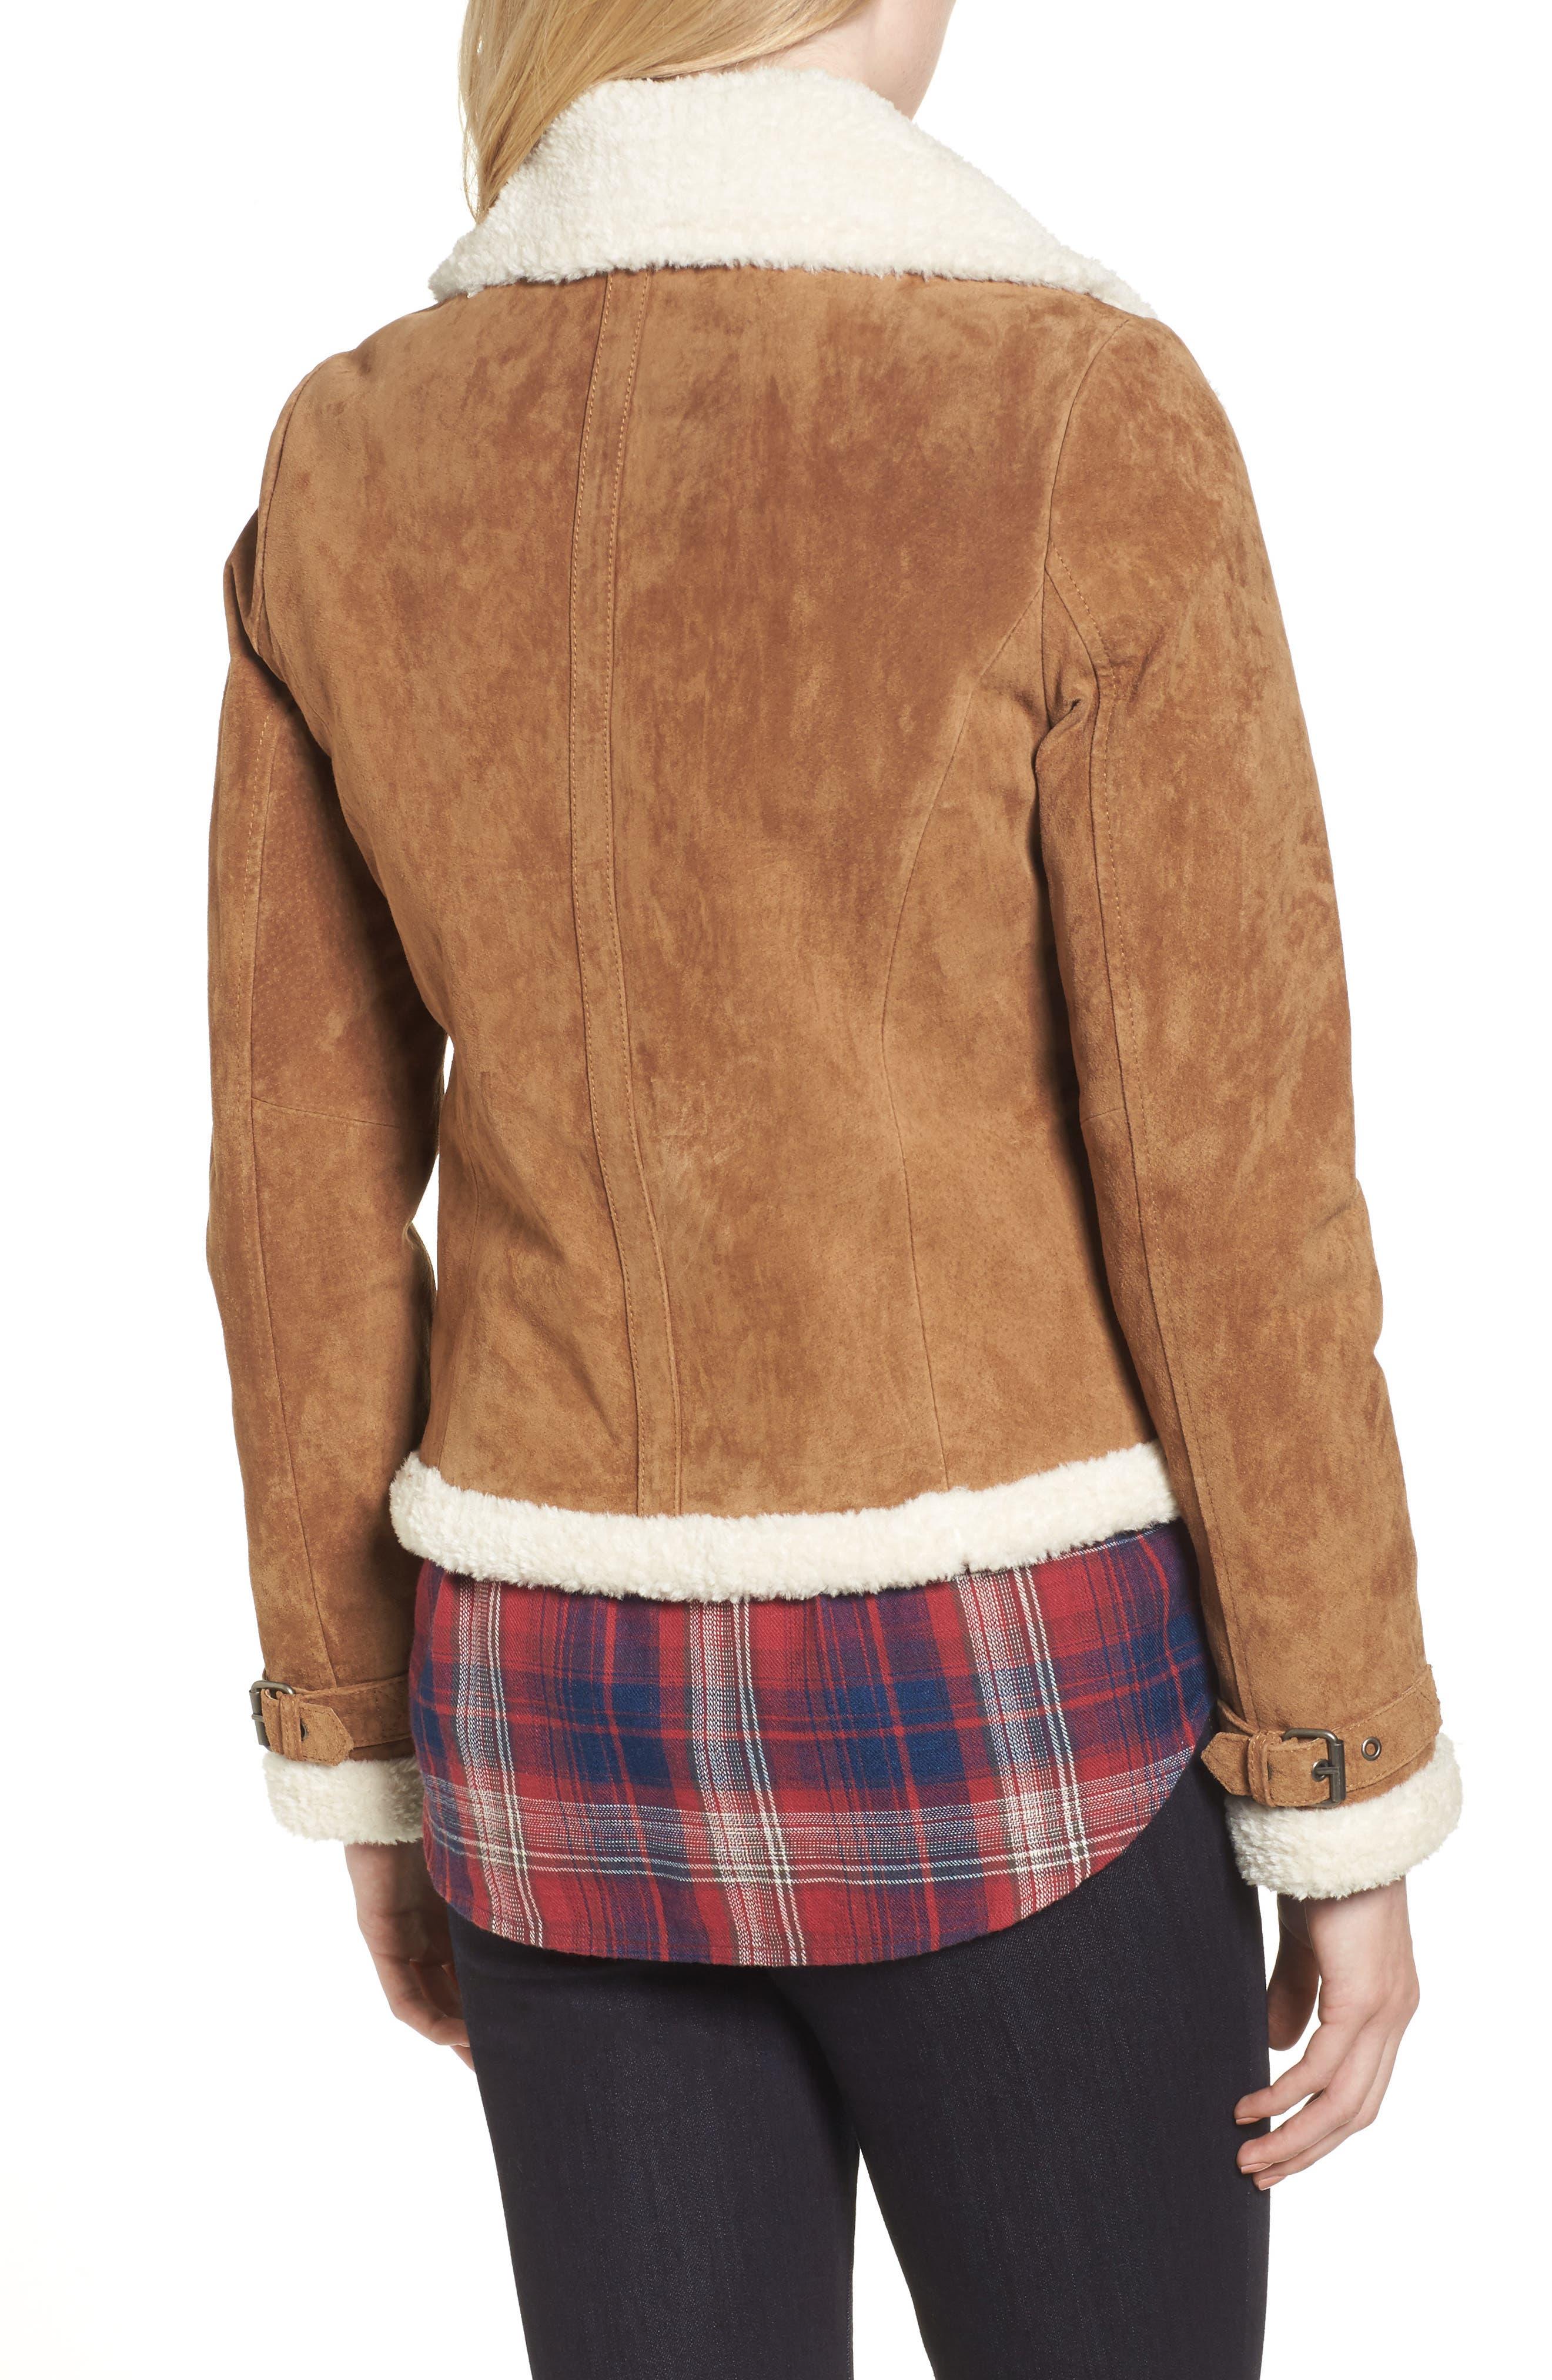 Leather Jacket with Faux Fur Trim,                             Alternate thumbnail 2, color,                             235